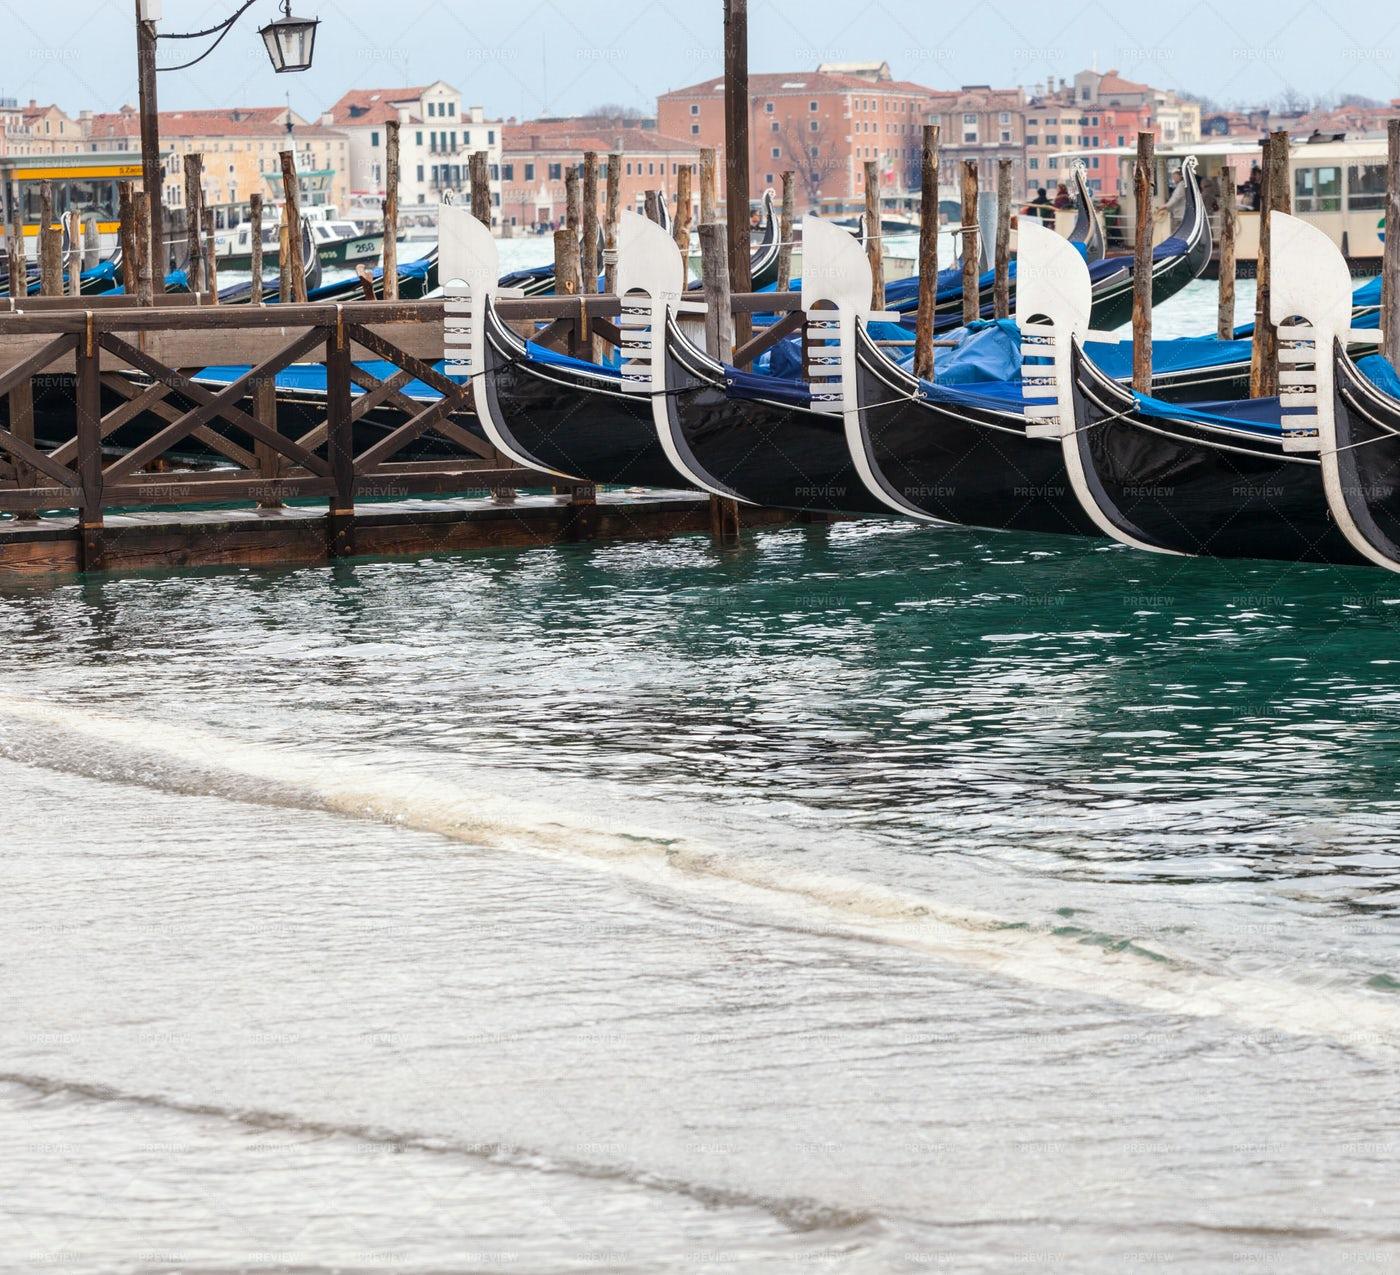 Venetian Gondolas At High Tide: Stock Photos